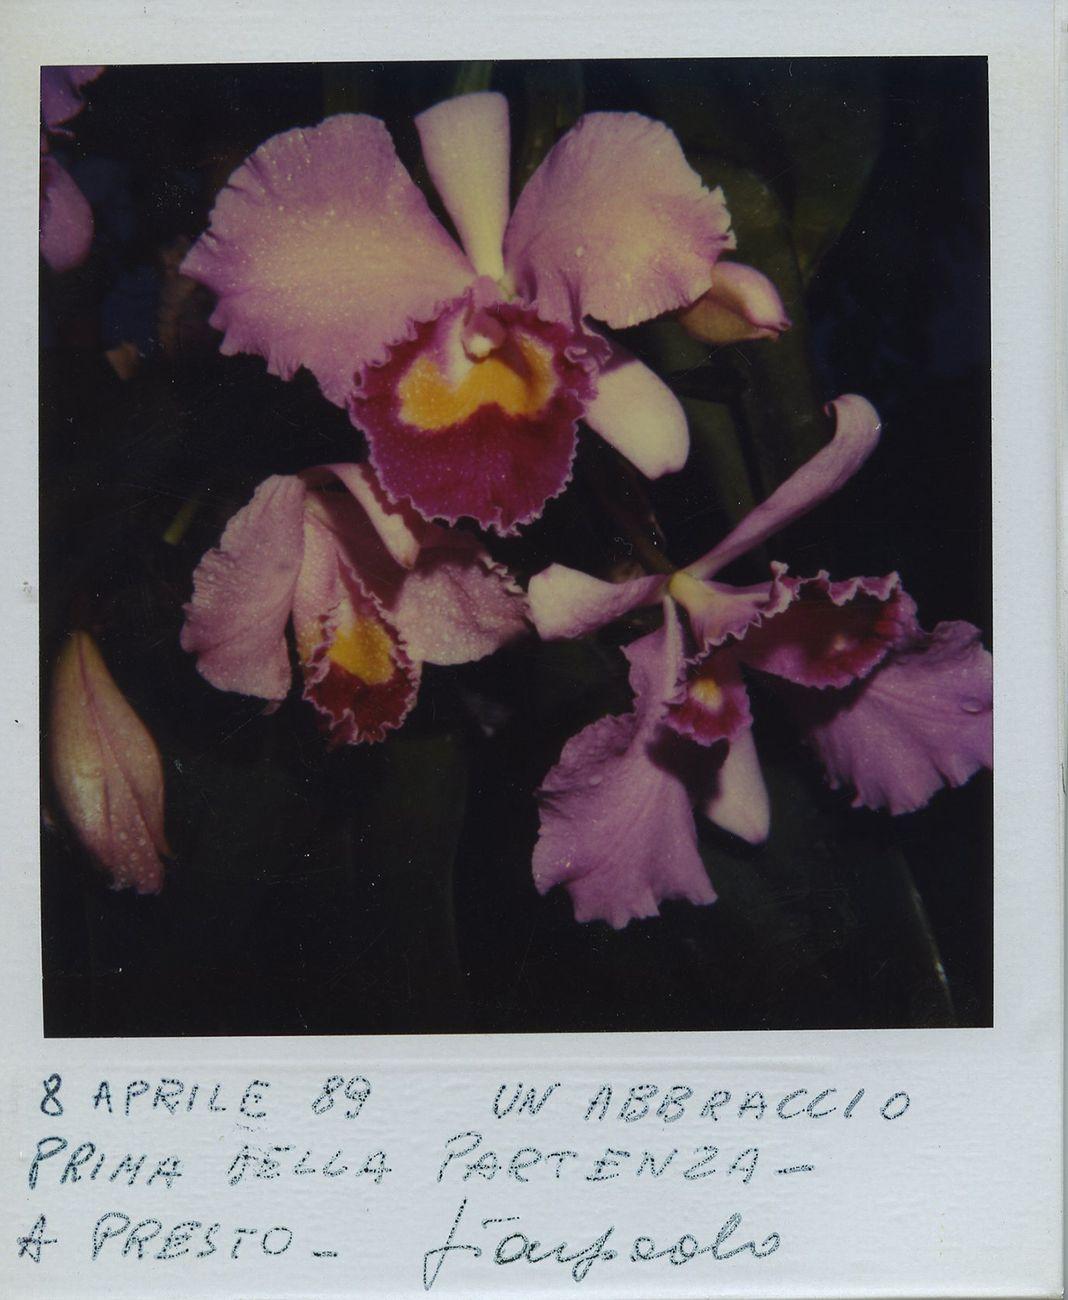 Gian Paolo Barbieri, Seychelles, 1989. Courtesy Fondazione Gian Paolo Barbieri © Gian Paolo Barbieri